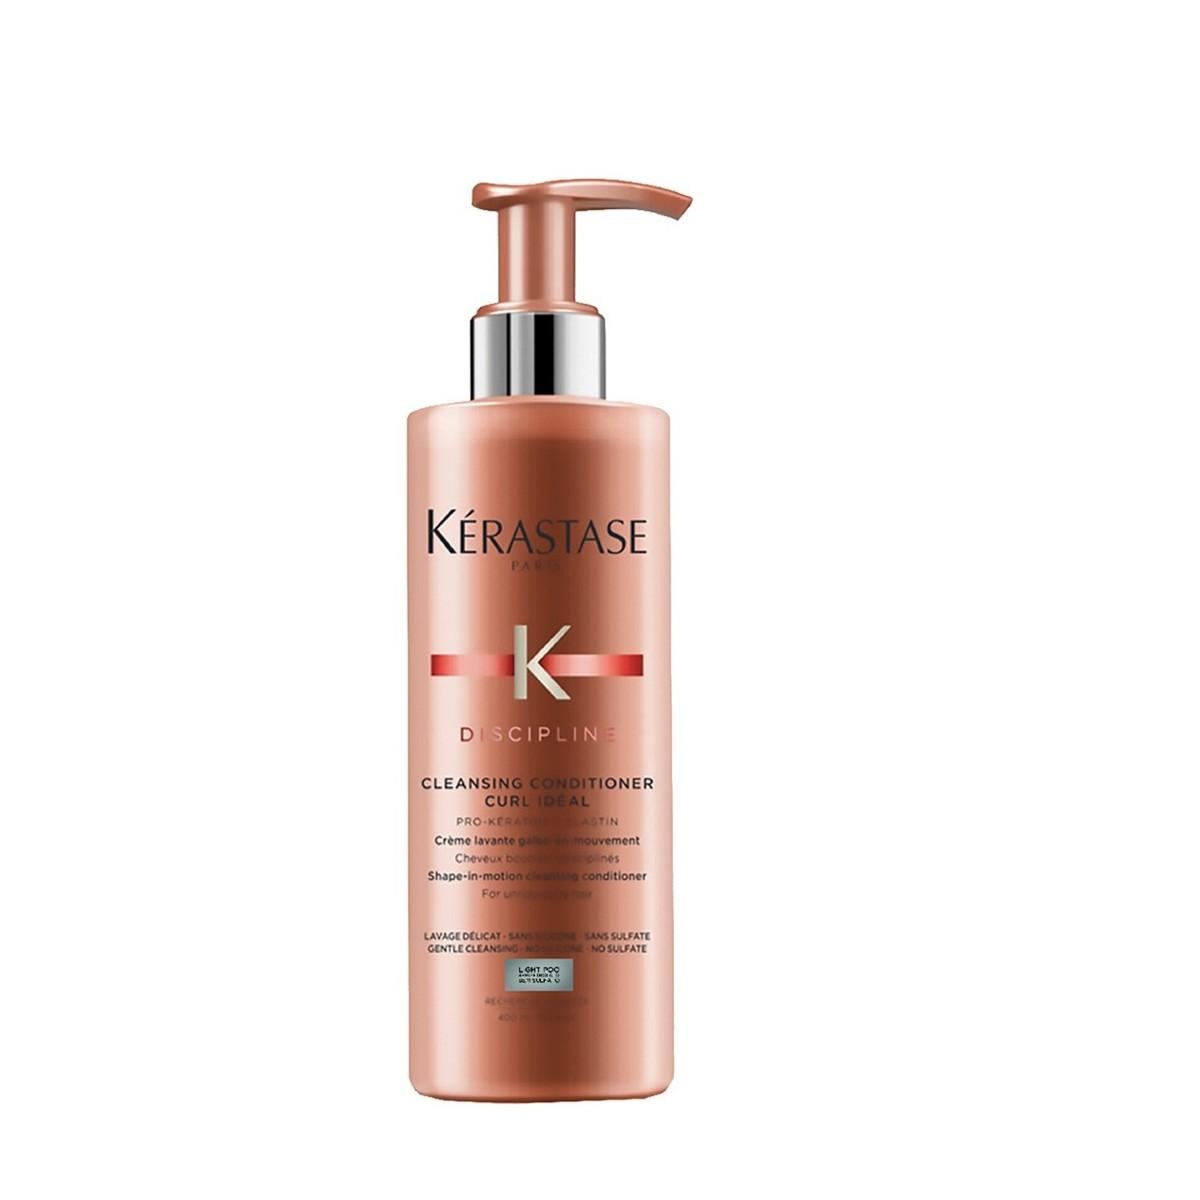 Kérastase Discipline Curl Ideal Light Poo - Shampoo - 400ml - CA